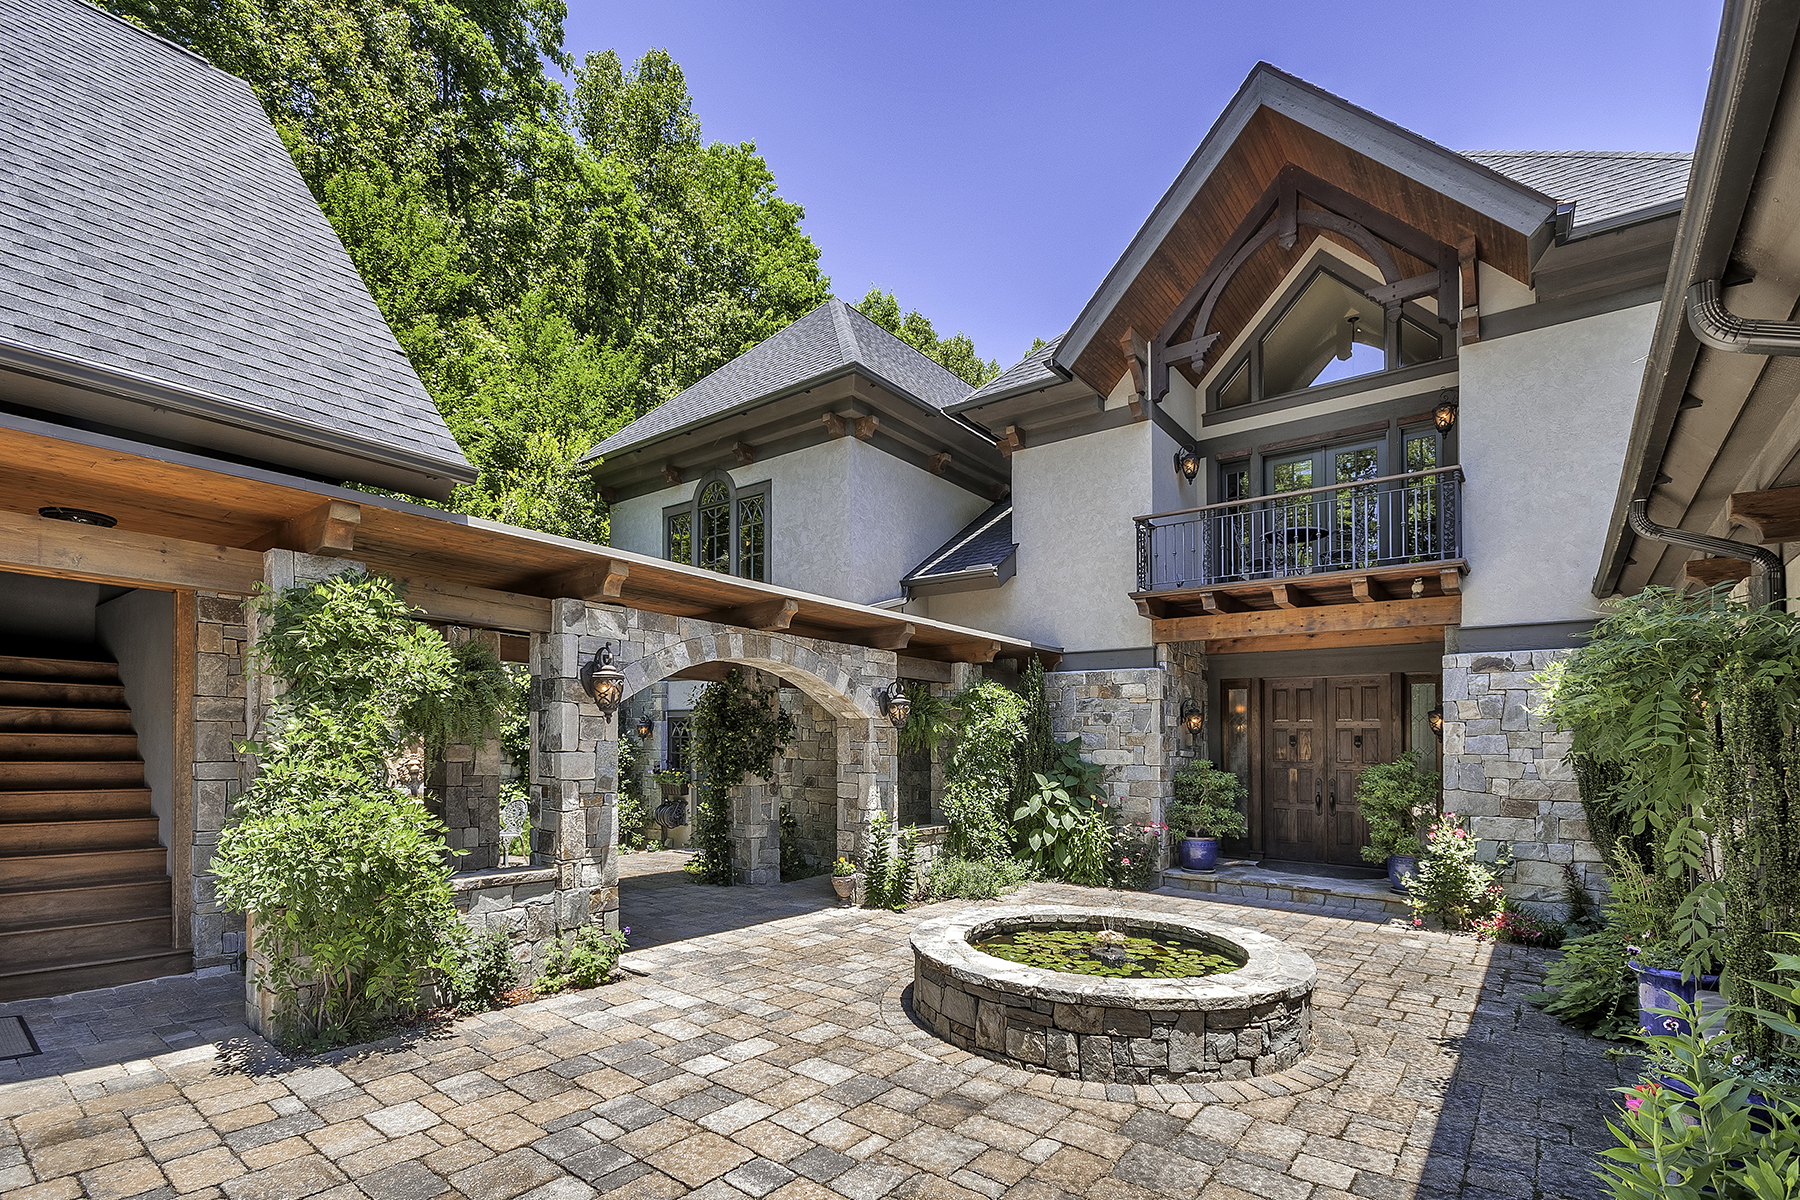 Single Family Home for Sale at OLETA FALLS 494 Overlook Park Dr Hendersonville, North Carolina, 28792 United States